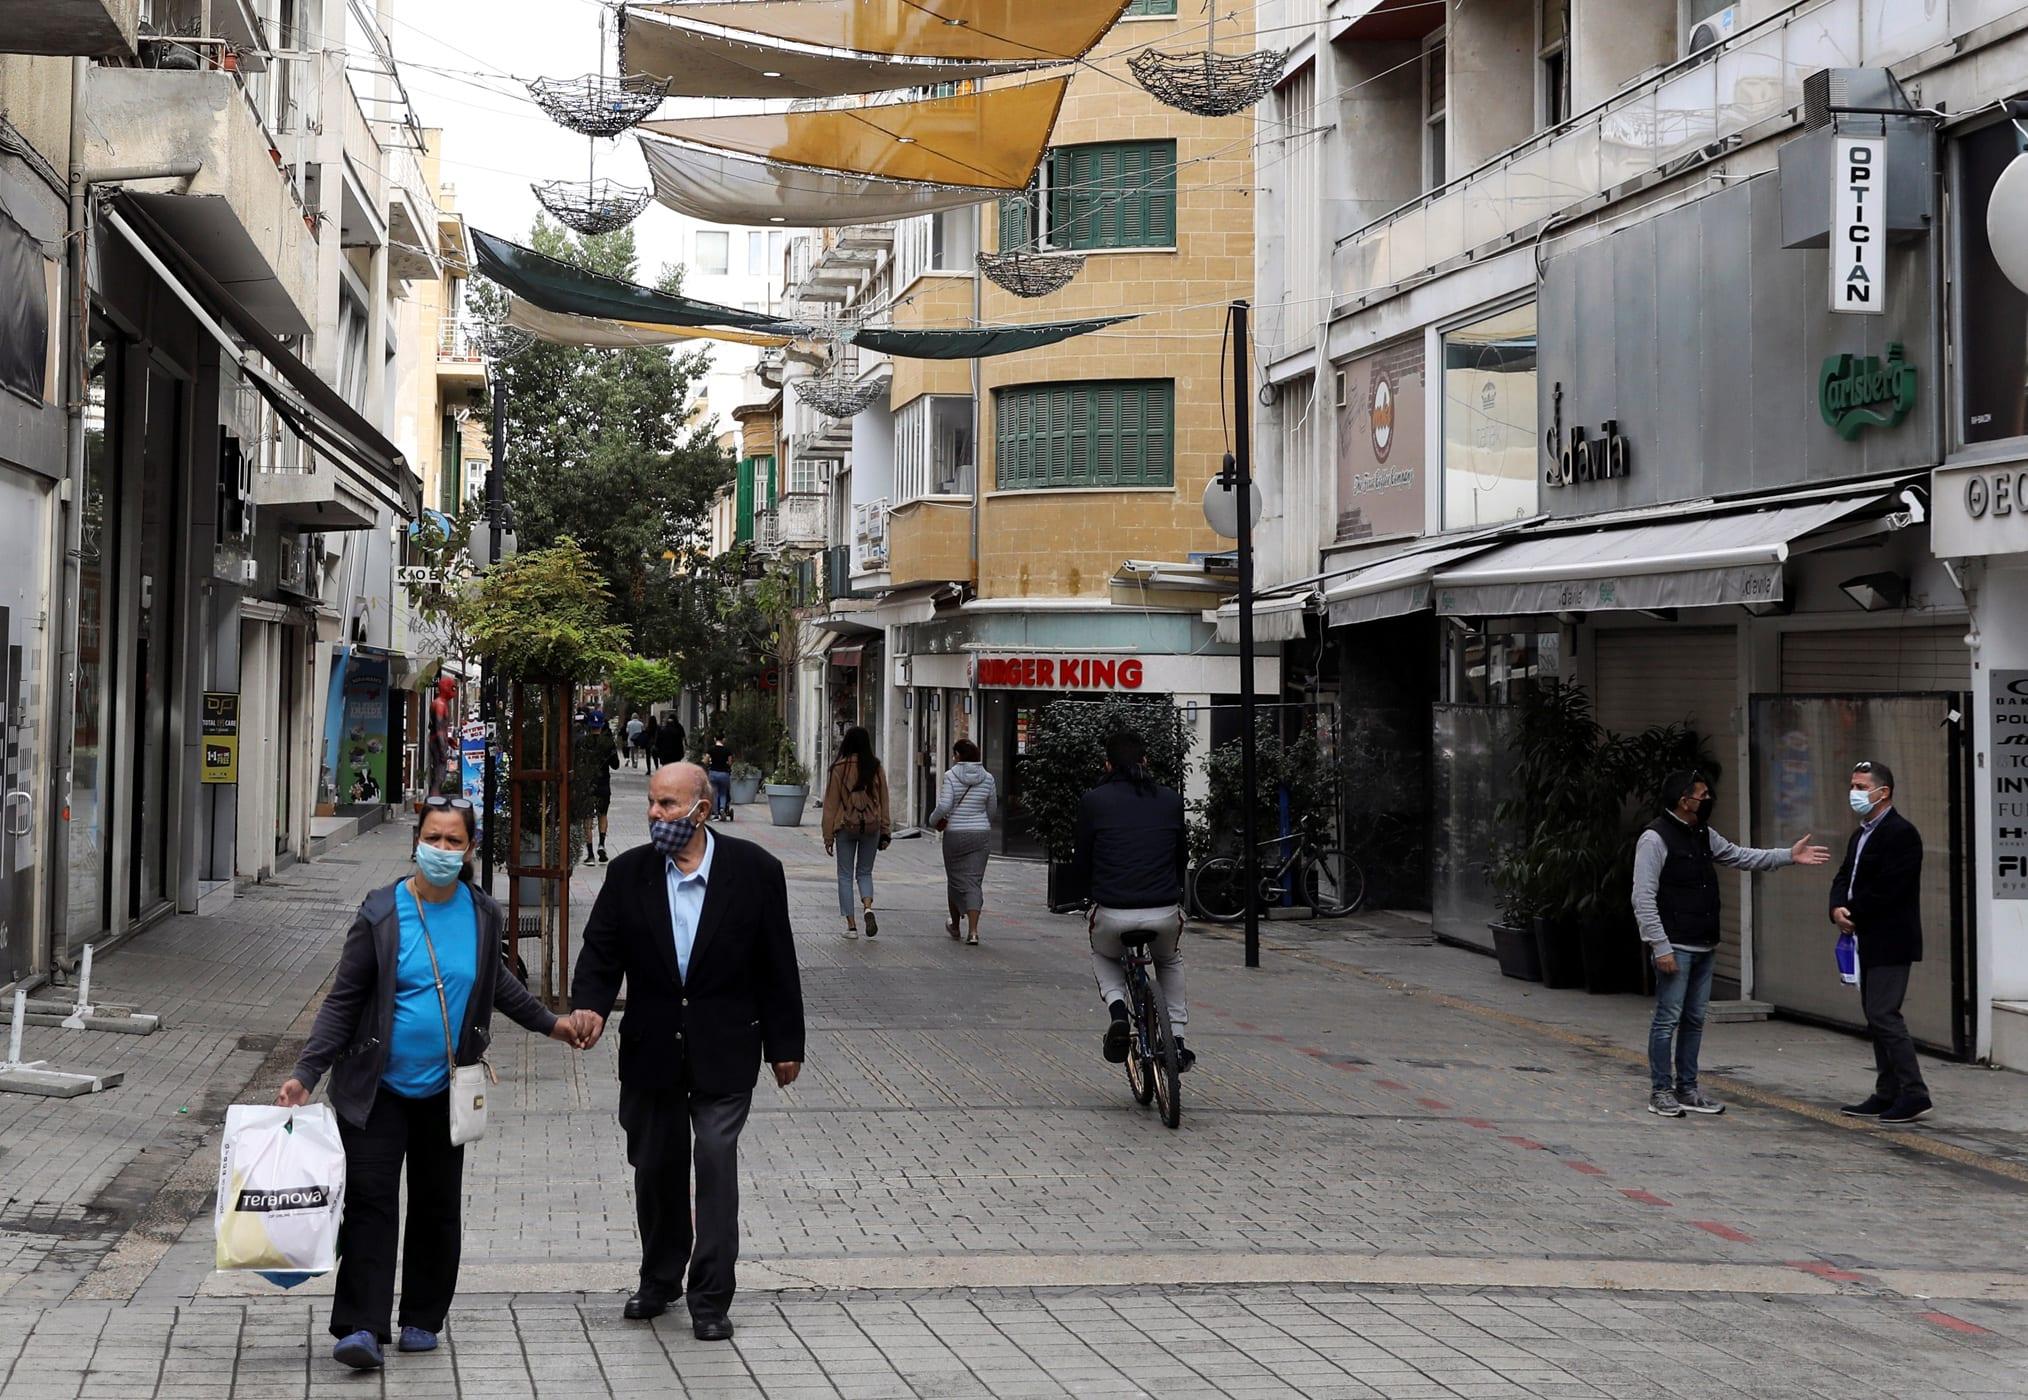 People wearing protective face masks walk in Ledra Street, a main shopping street in Nicosia, amid the coronavirus disease (COVID-19) pandemic, Cyprus December 11, 2020. REUTERS/Yiannis Kourtoglou